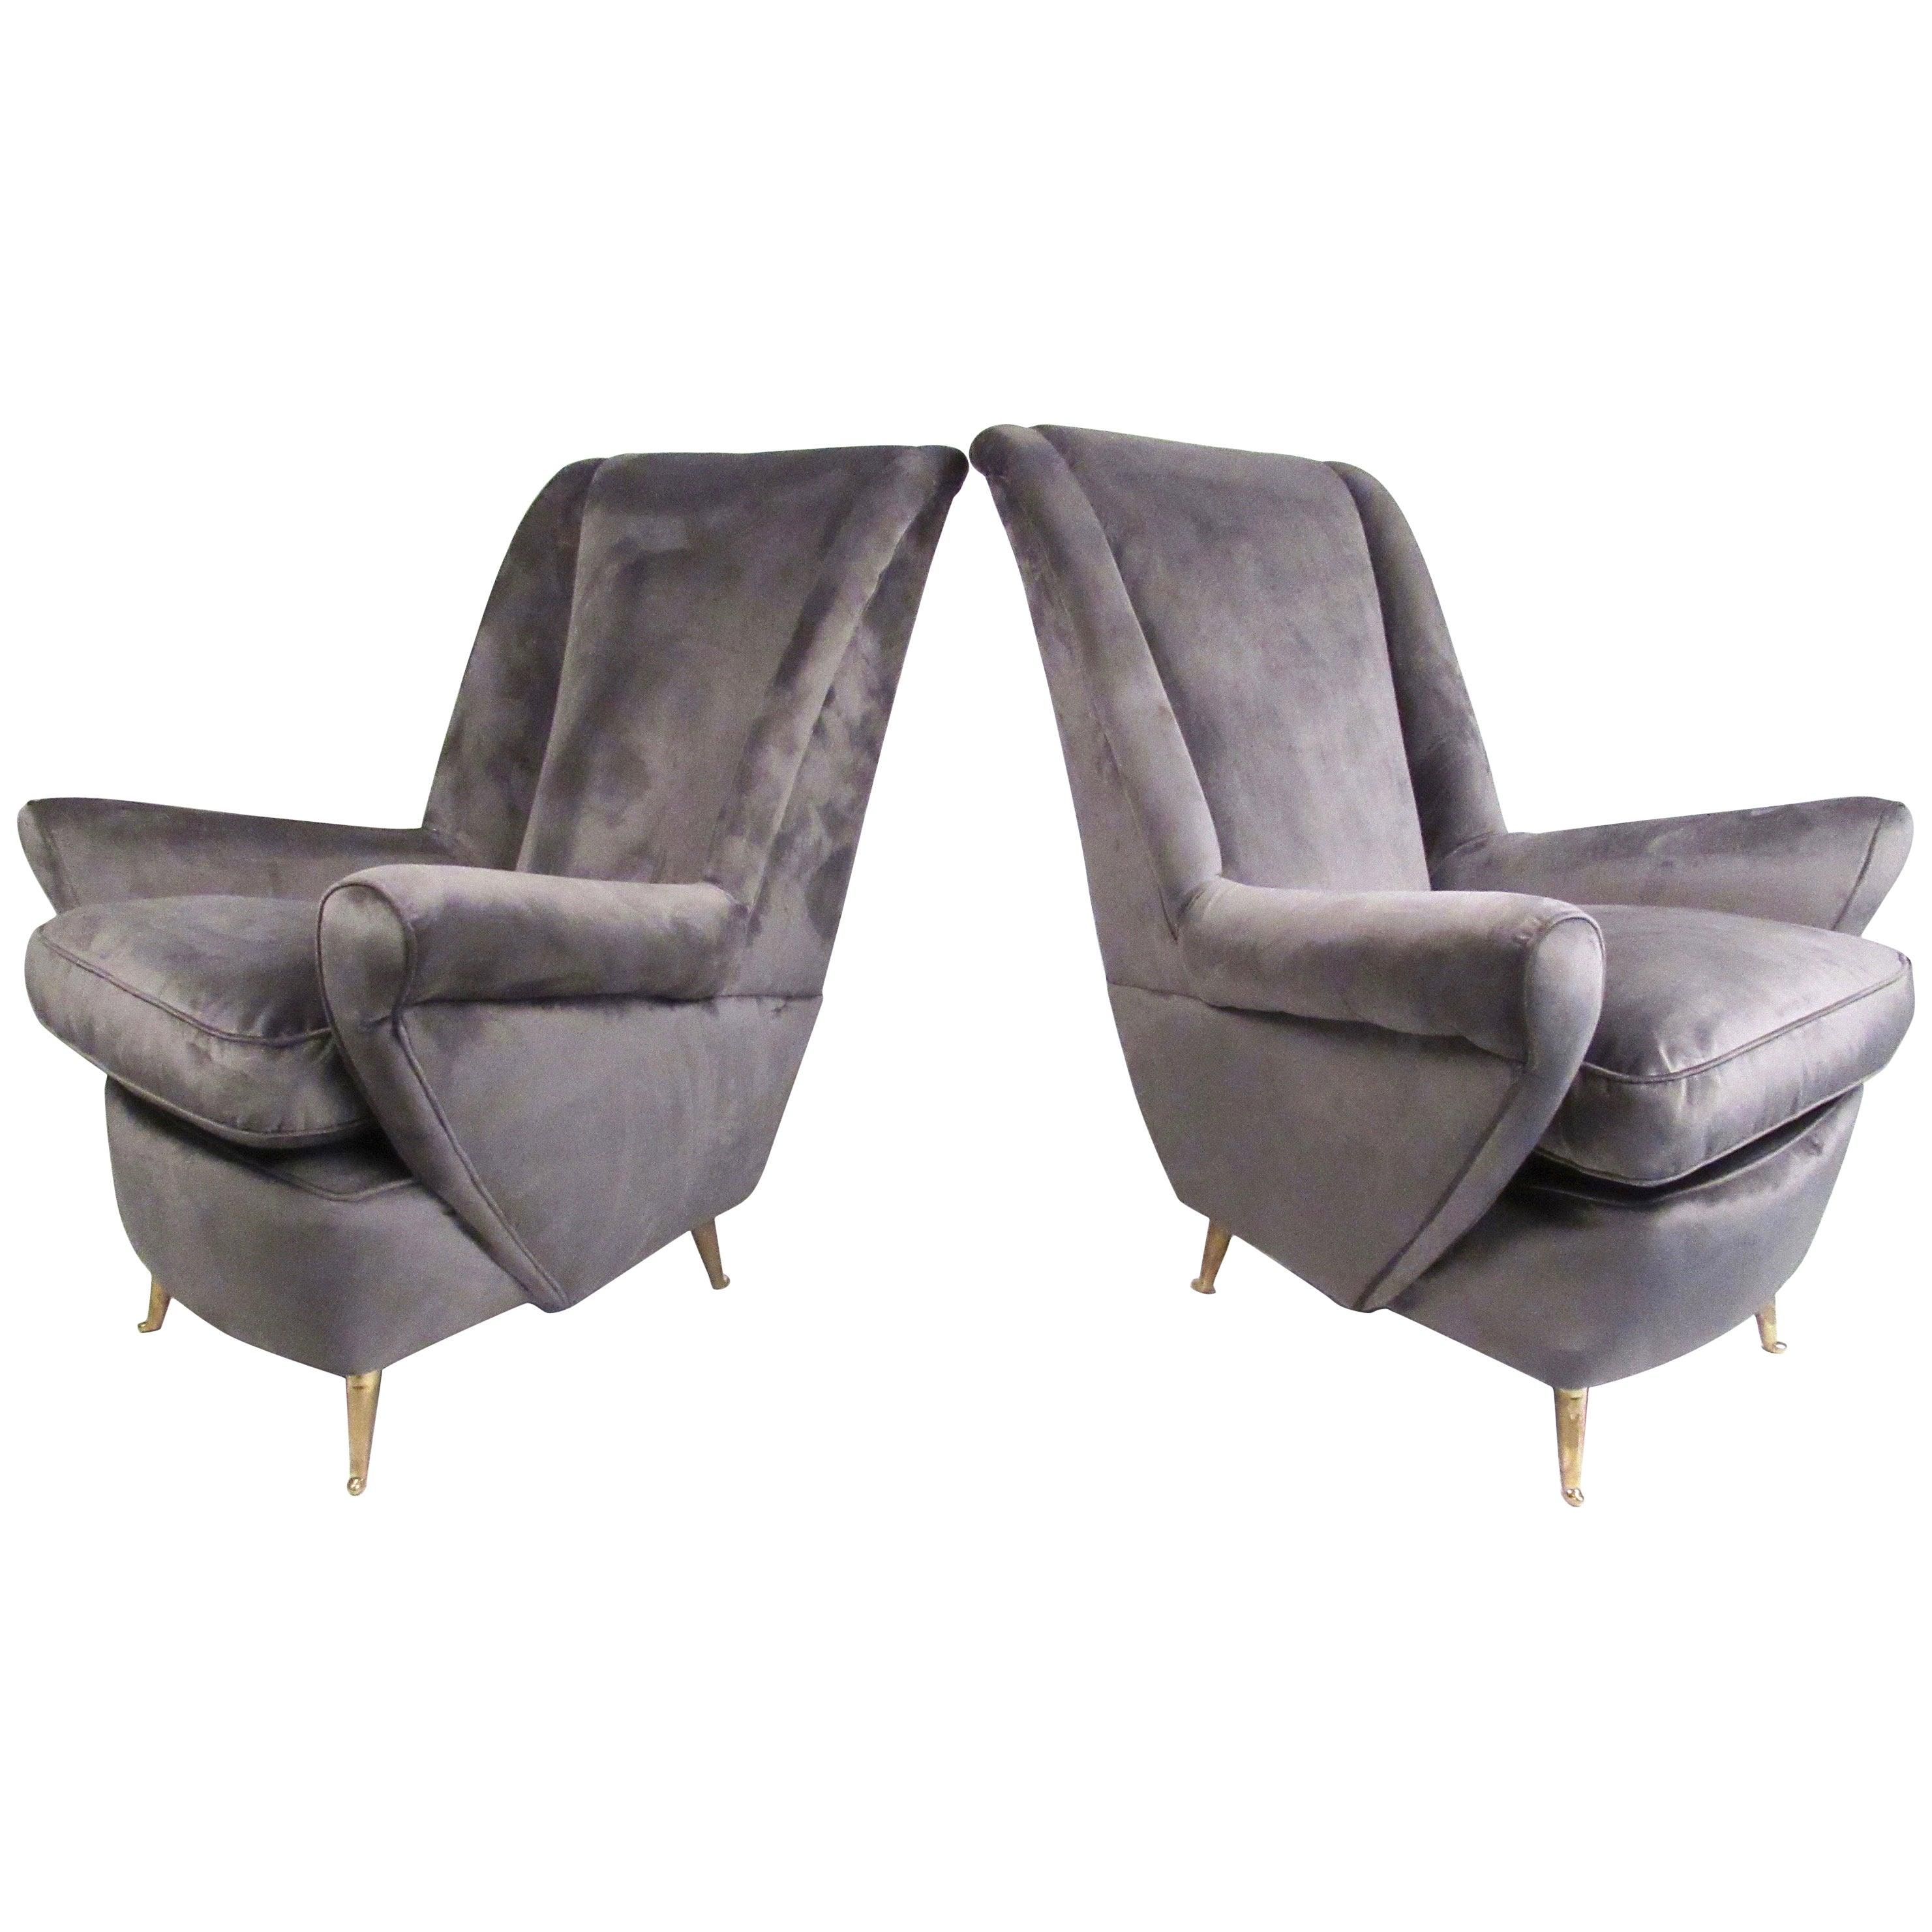 Pair Italian Modern Lounge Chairs for Arredamenti ISA